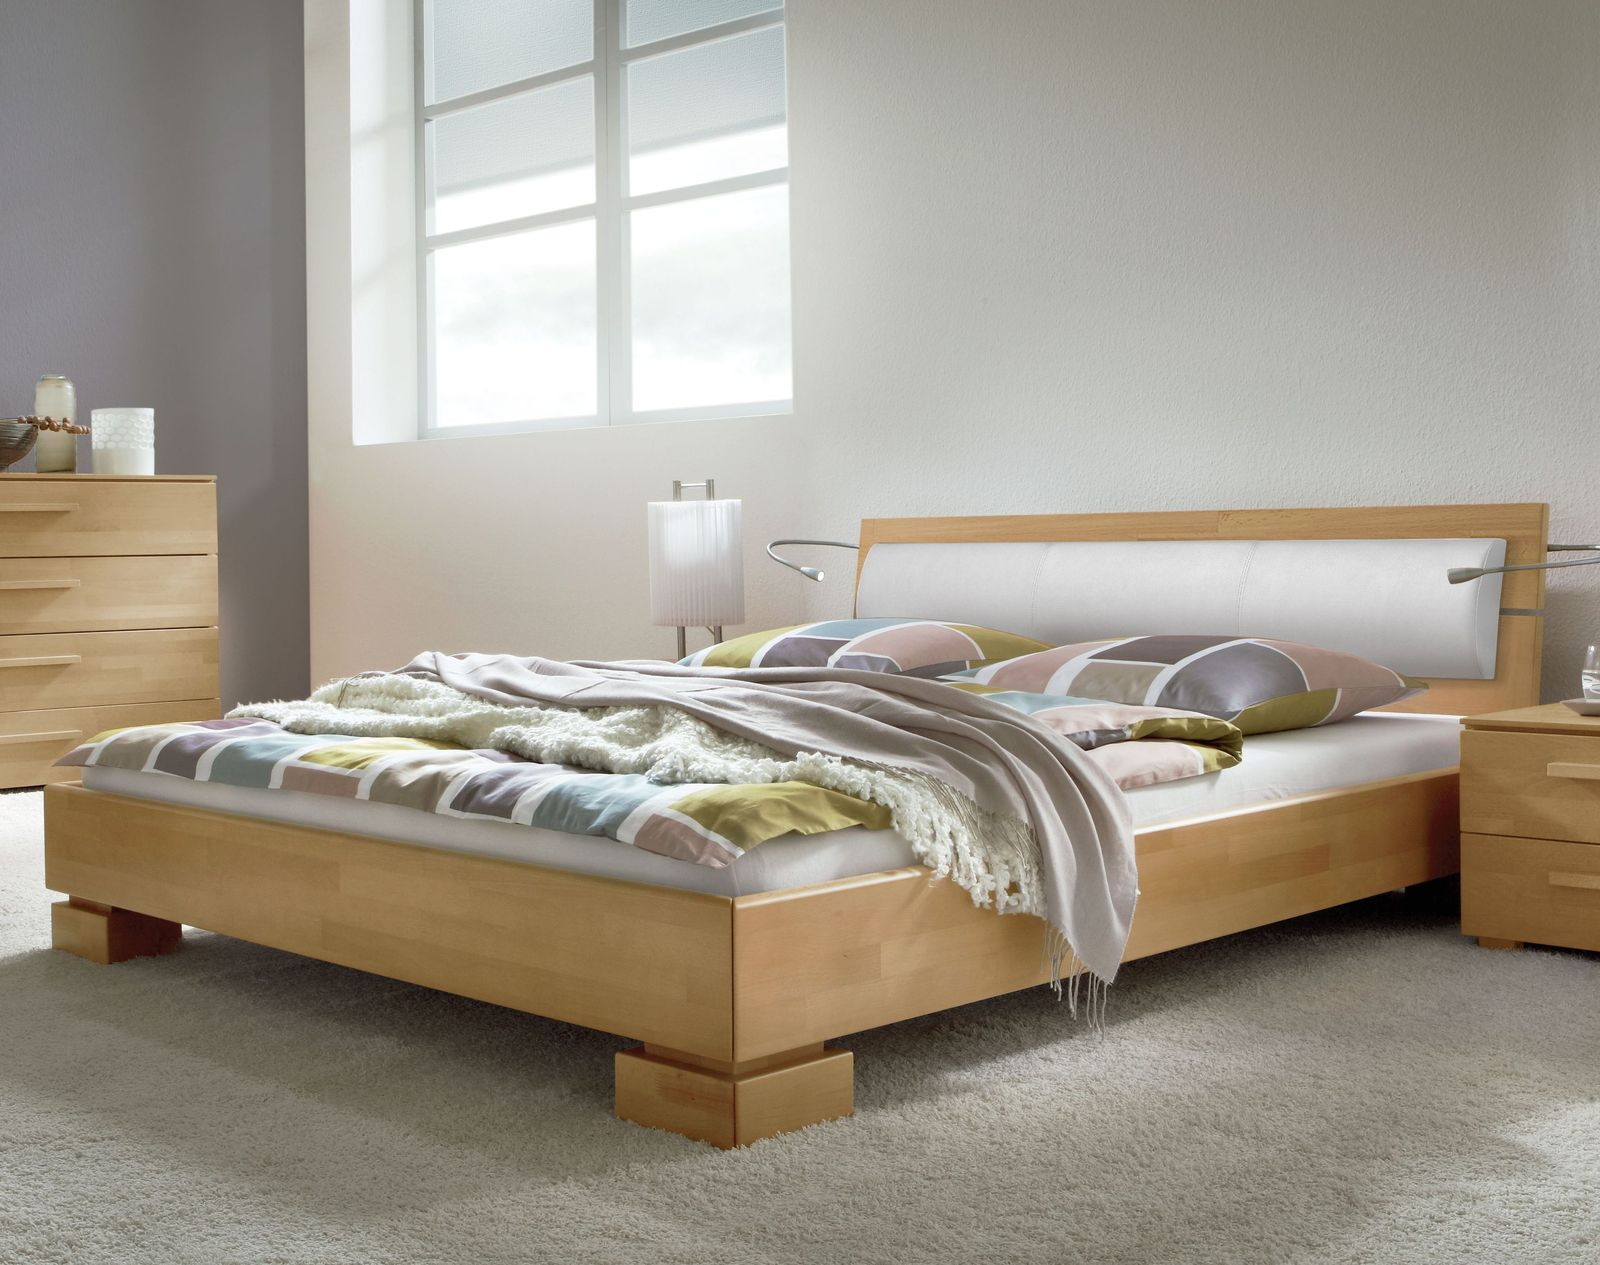 hochwertiges bett aus massiver buche lackiert - bett lima - Hochwertiges Bett Fur Schlafzimmer Qualitatsgarantie